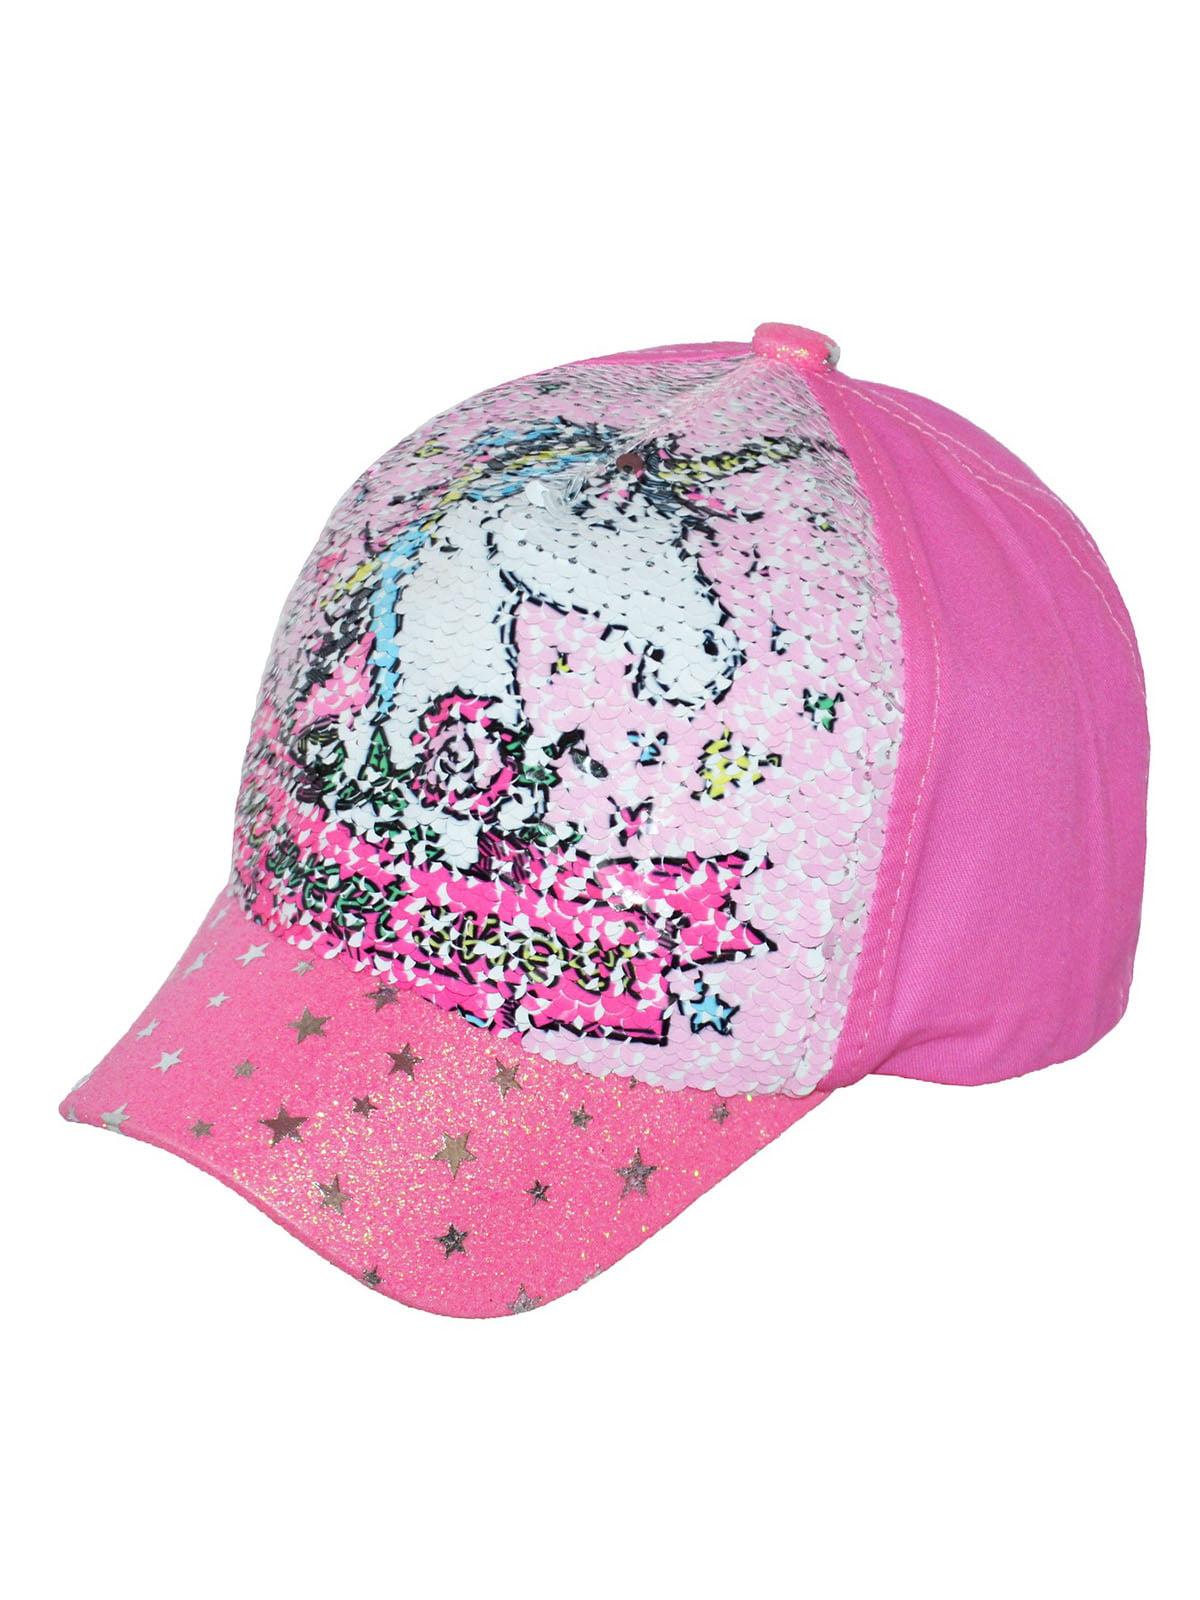 Кепка рожева з принтом | 5424211